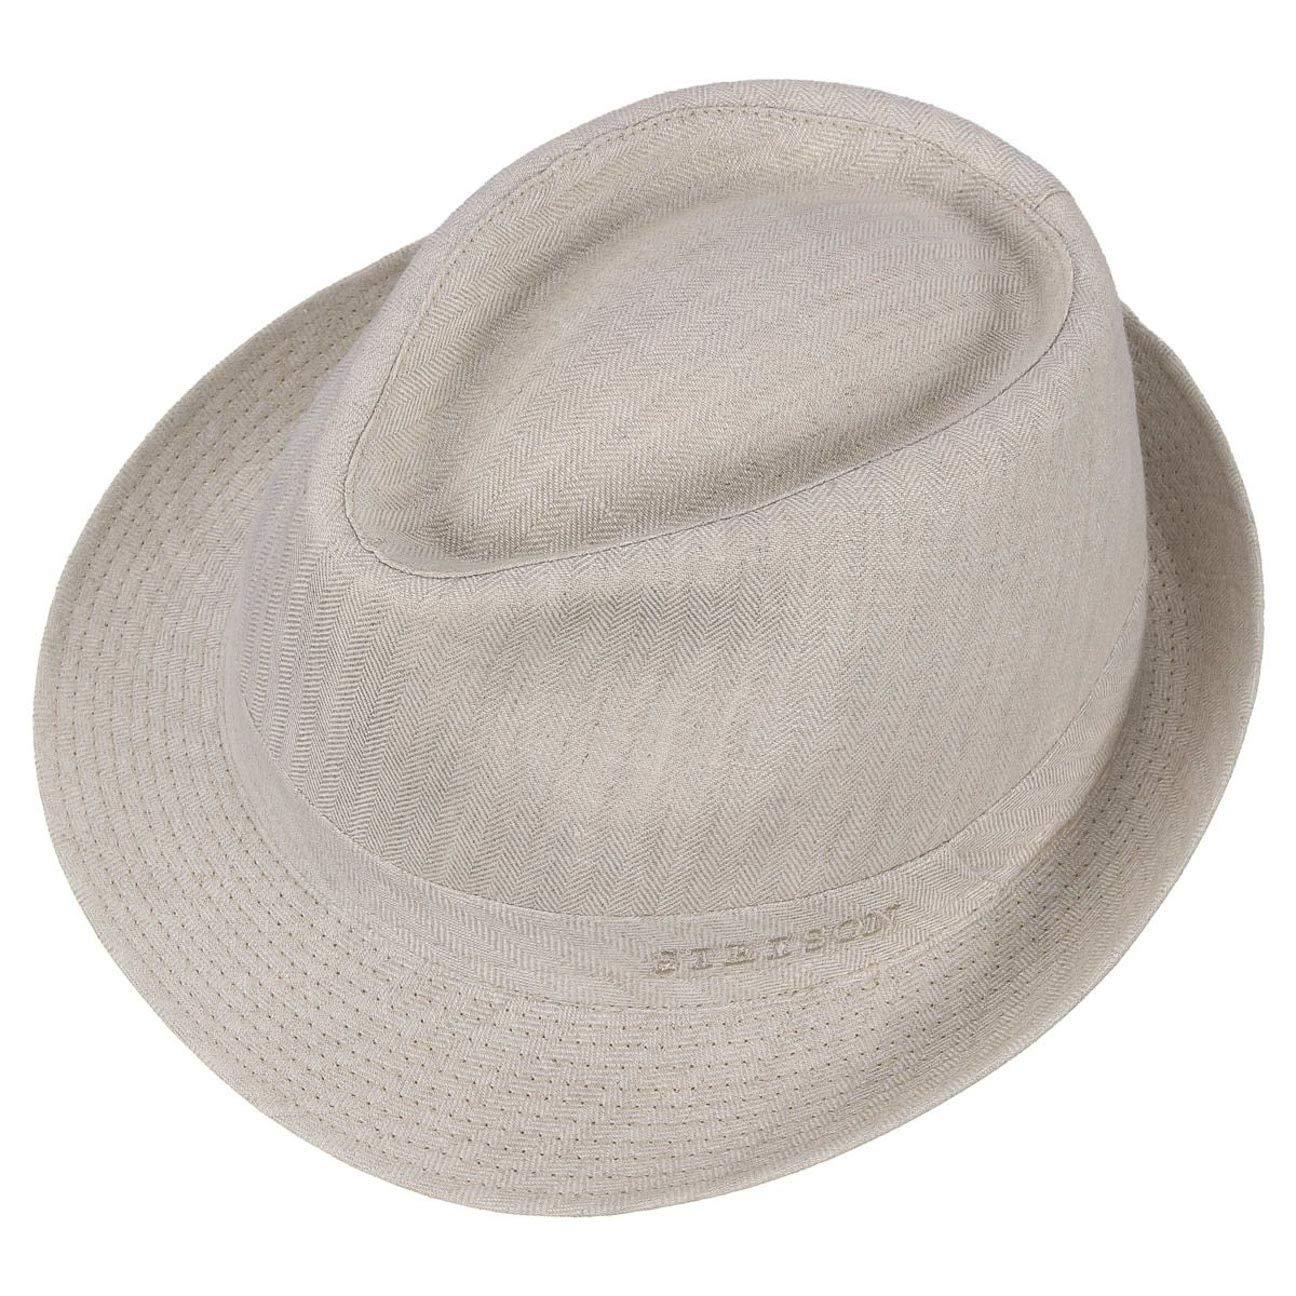 61a27804c3076 Stetson Osceola Trilby Linen Hat Women Men at Amazon Men s Clothing store